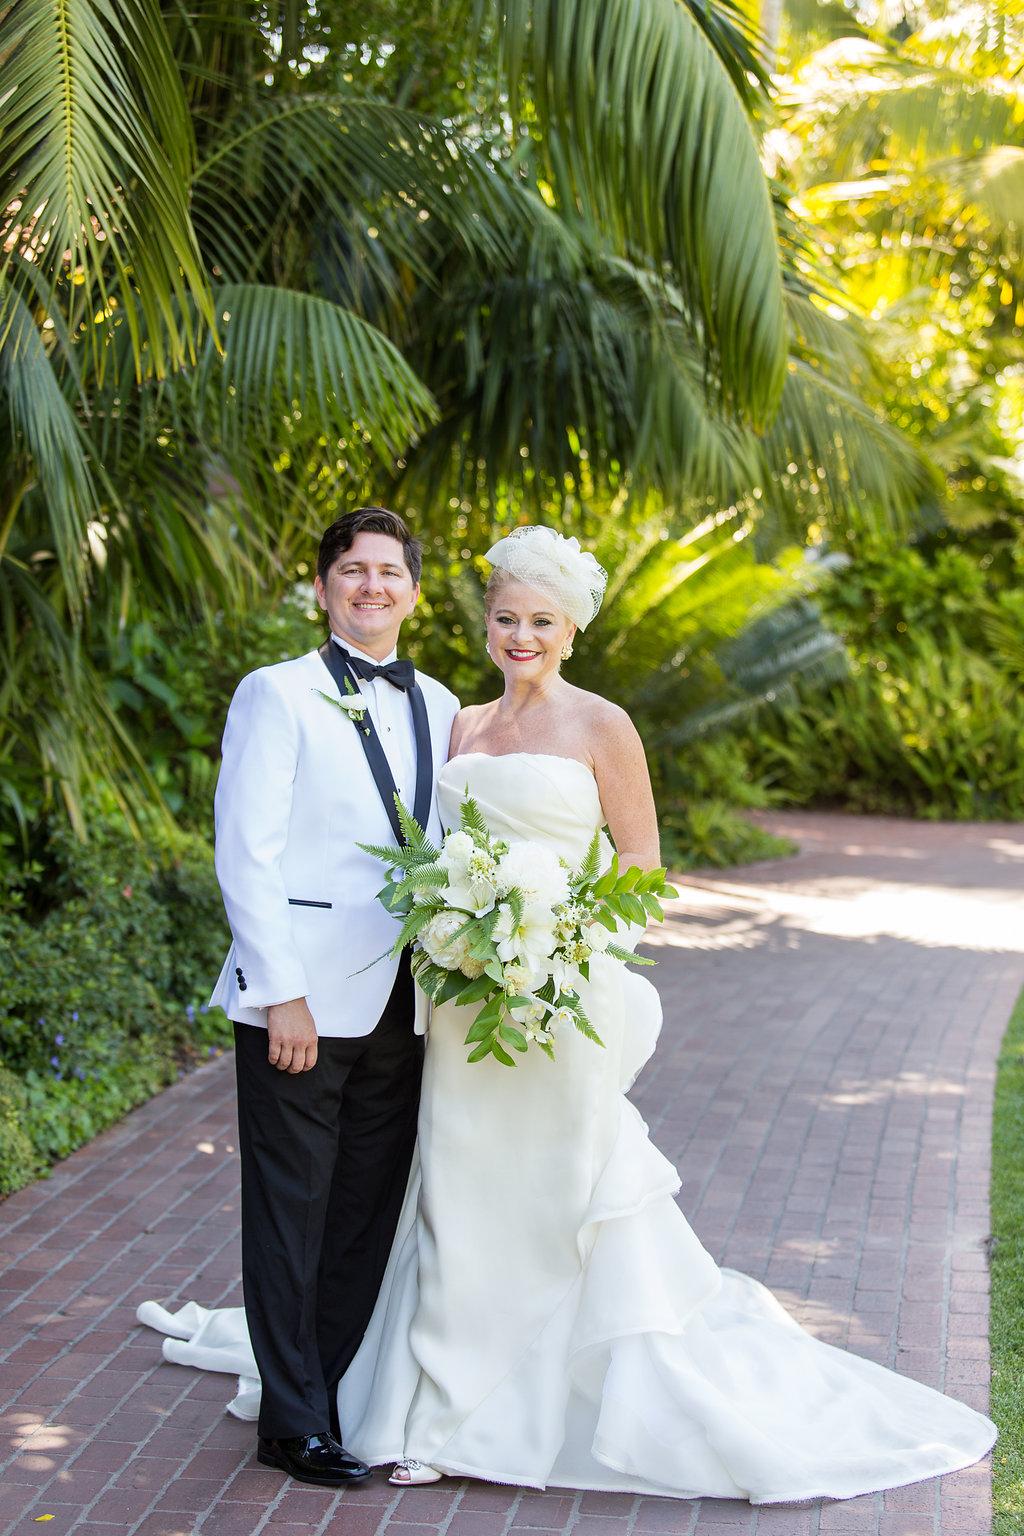 www.santabarbarawedding.com | Melissa Musgrove Photography | Four Seasons Resort The Biltmore | Bride and Groom